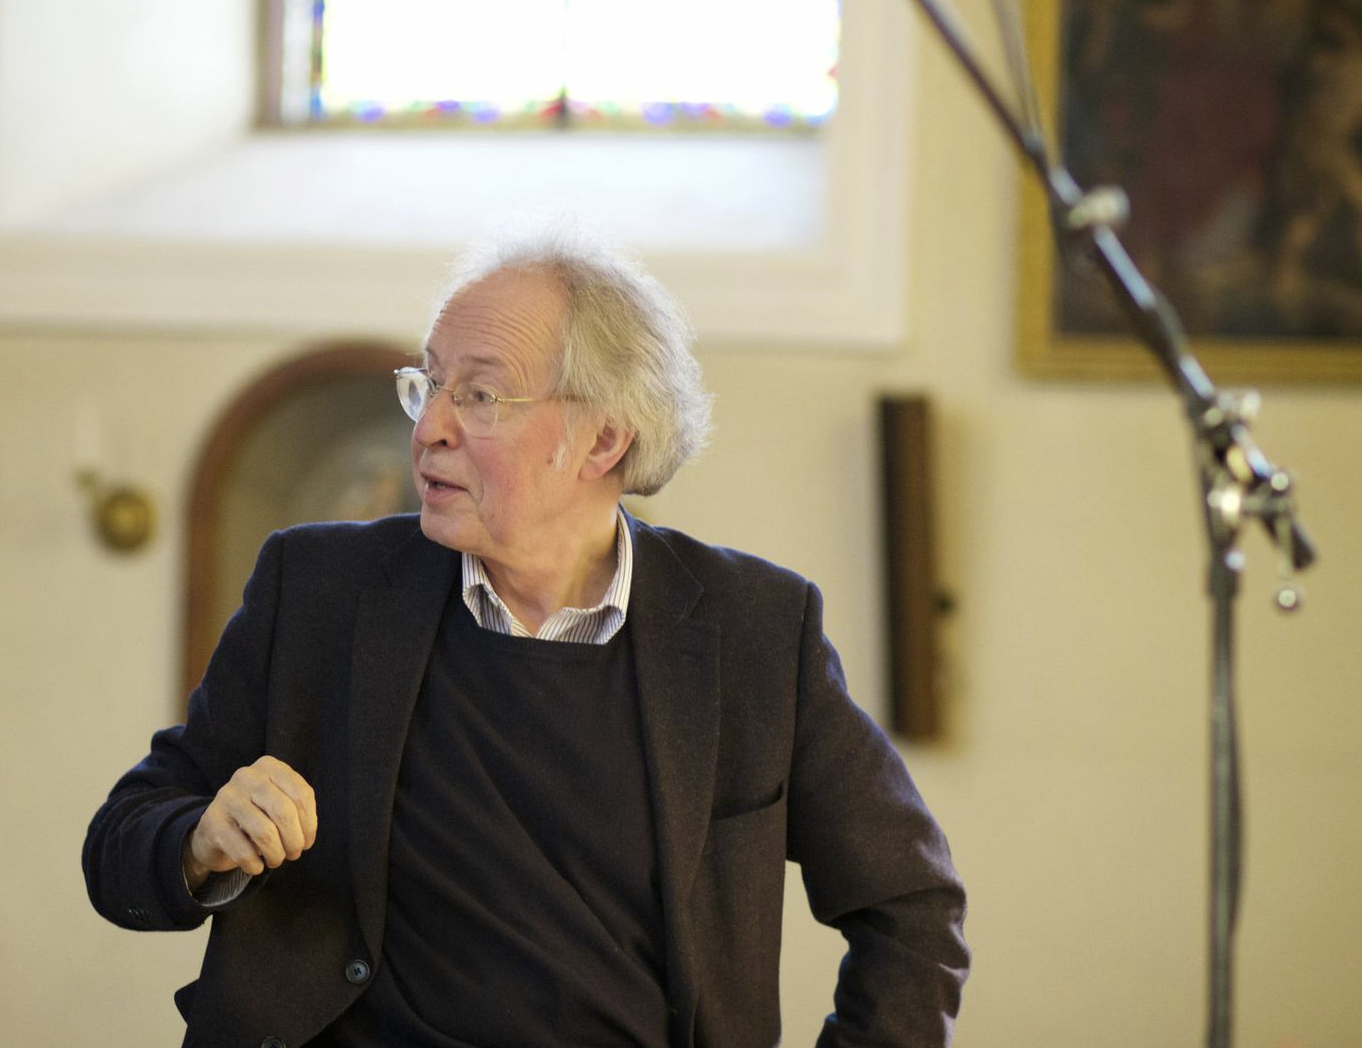 Hans Michael Beuerle en octobre dernier, lors de l'enregistrement du Requiem de Campra. Benoît Haller figuraient parmi les solistes.